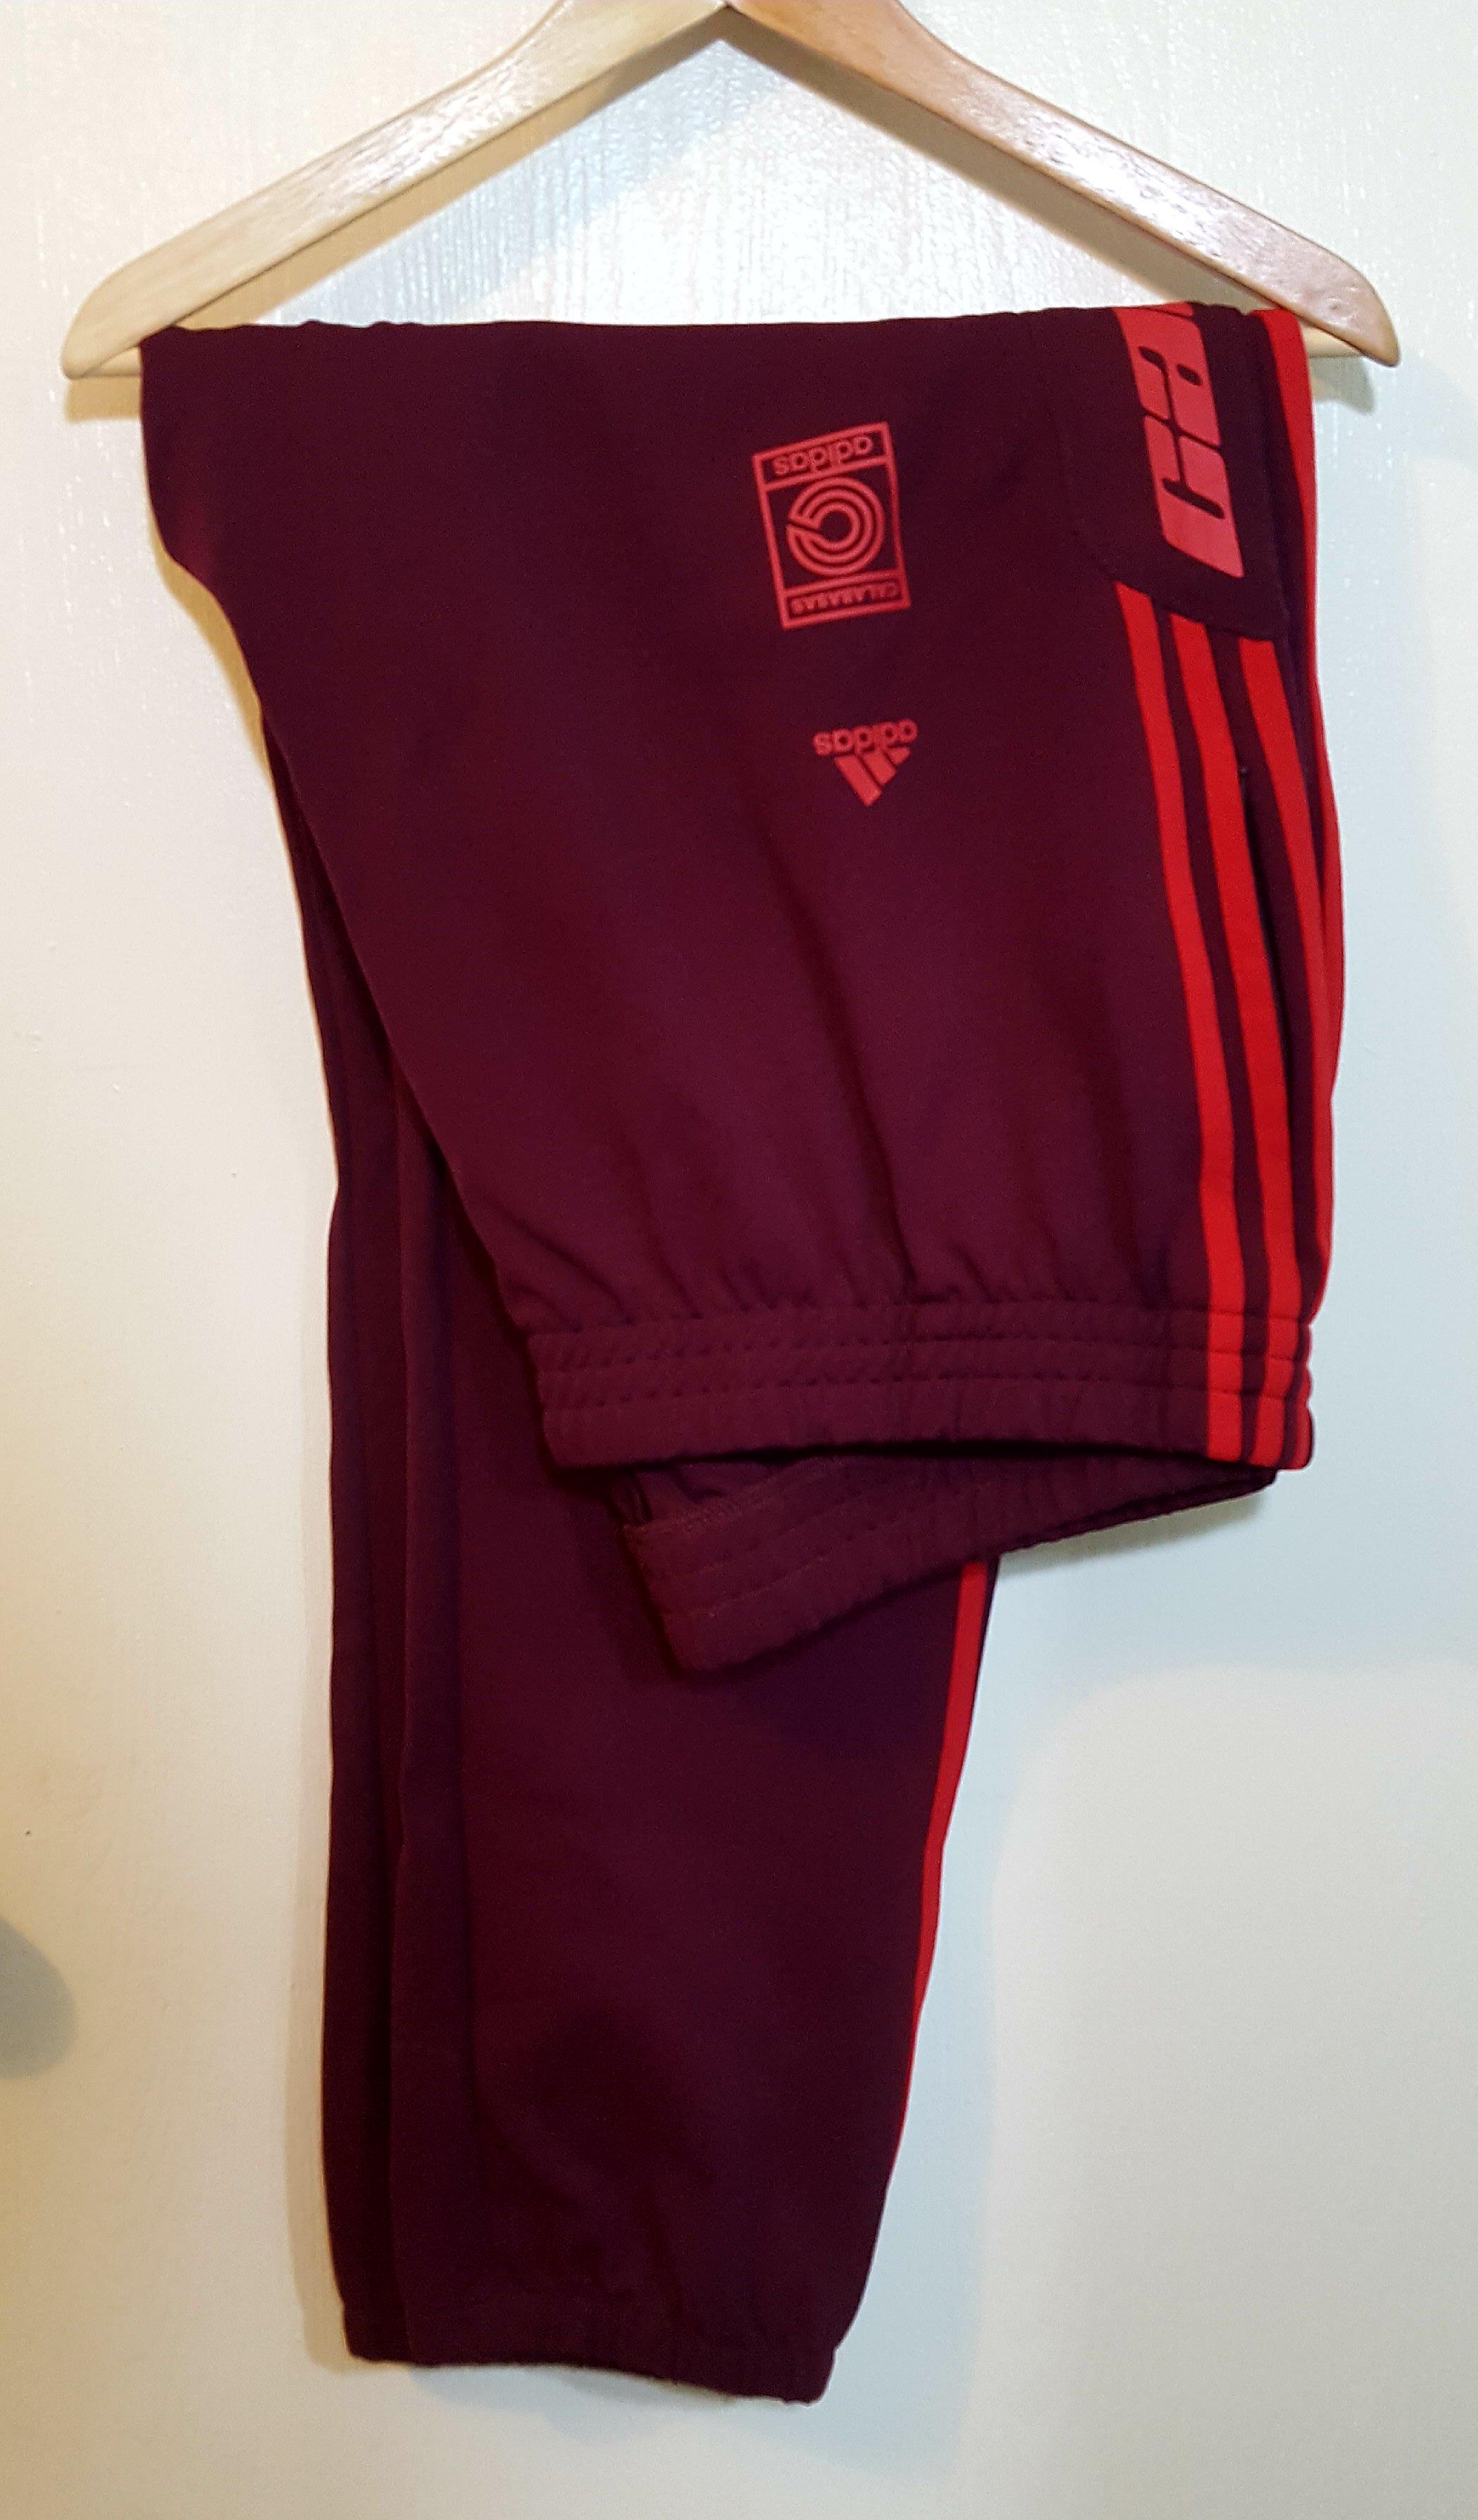 c256cf5b76beb Adidas Kanye West Brand New Yeezy Calabasas Track Pants | Grailed